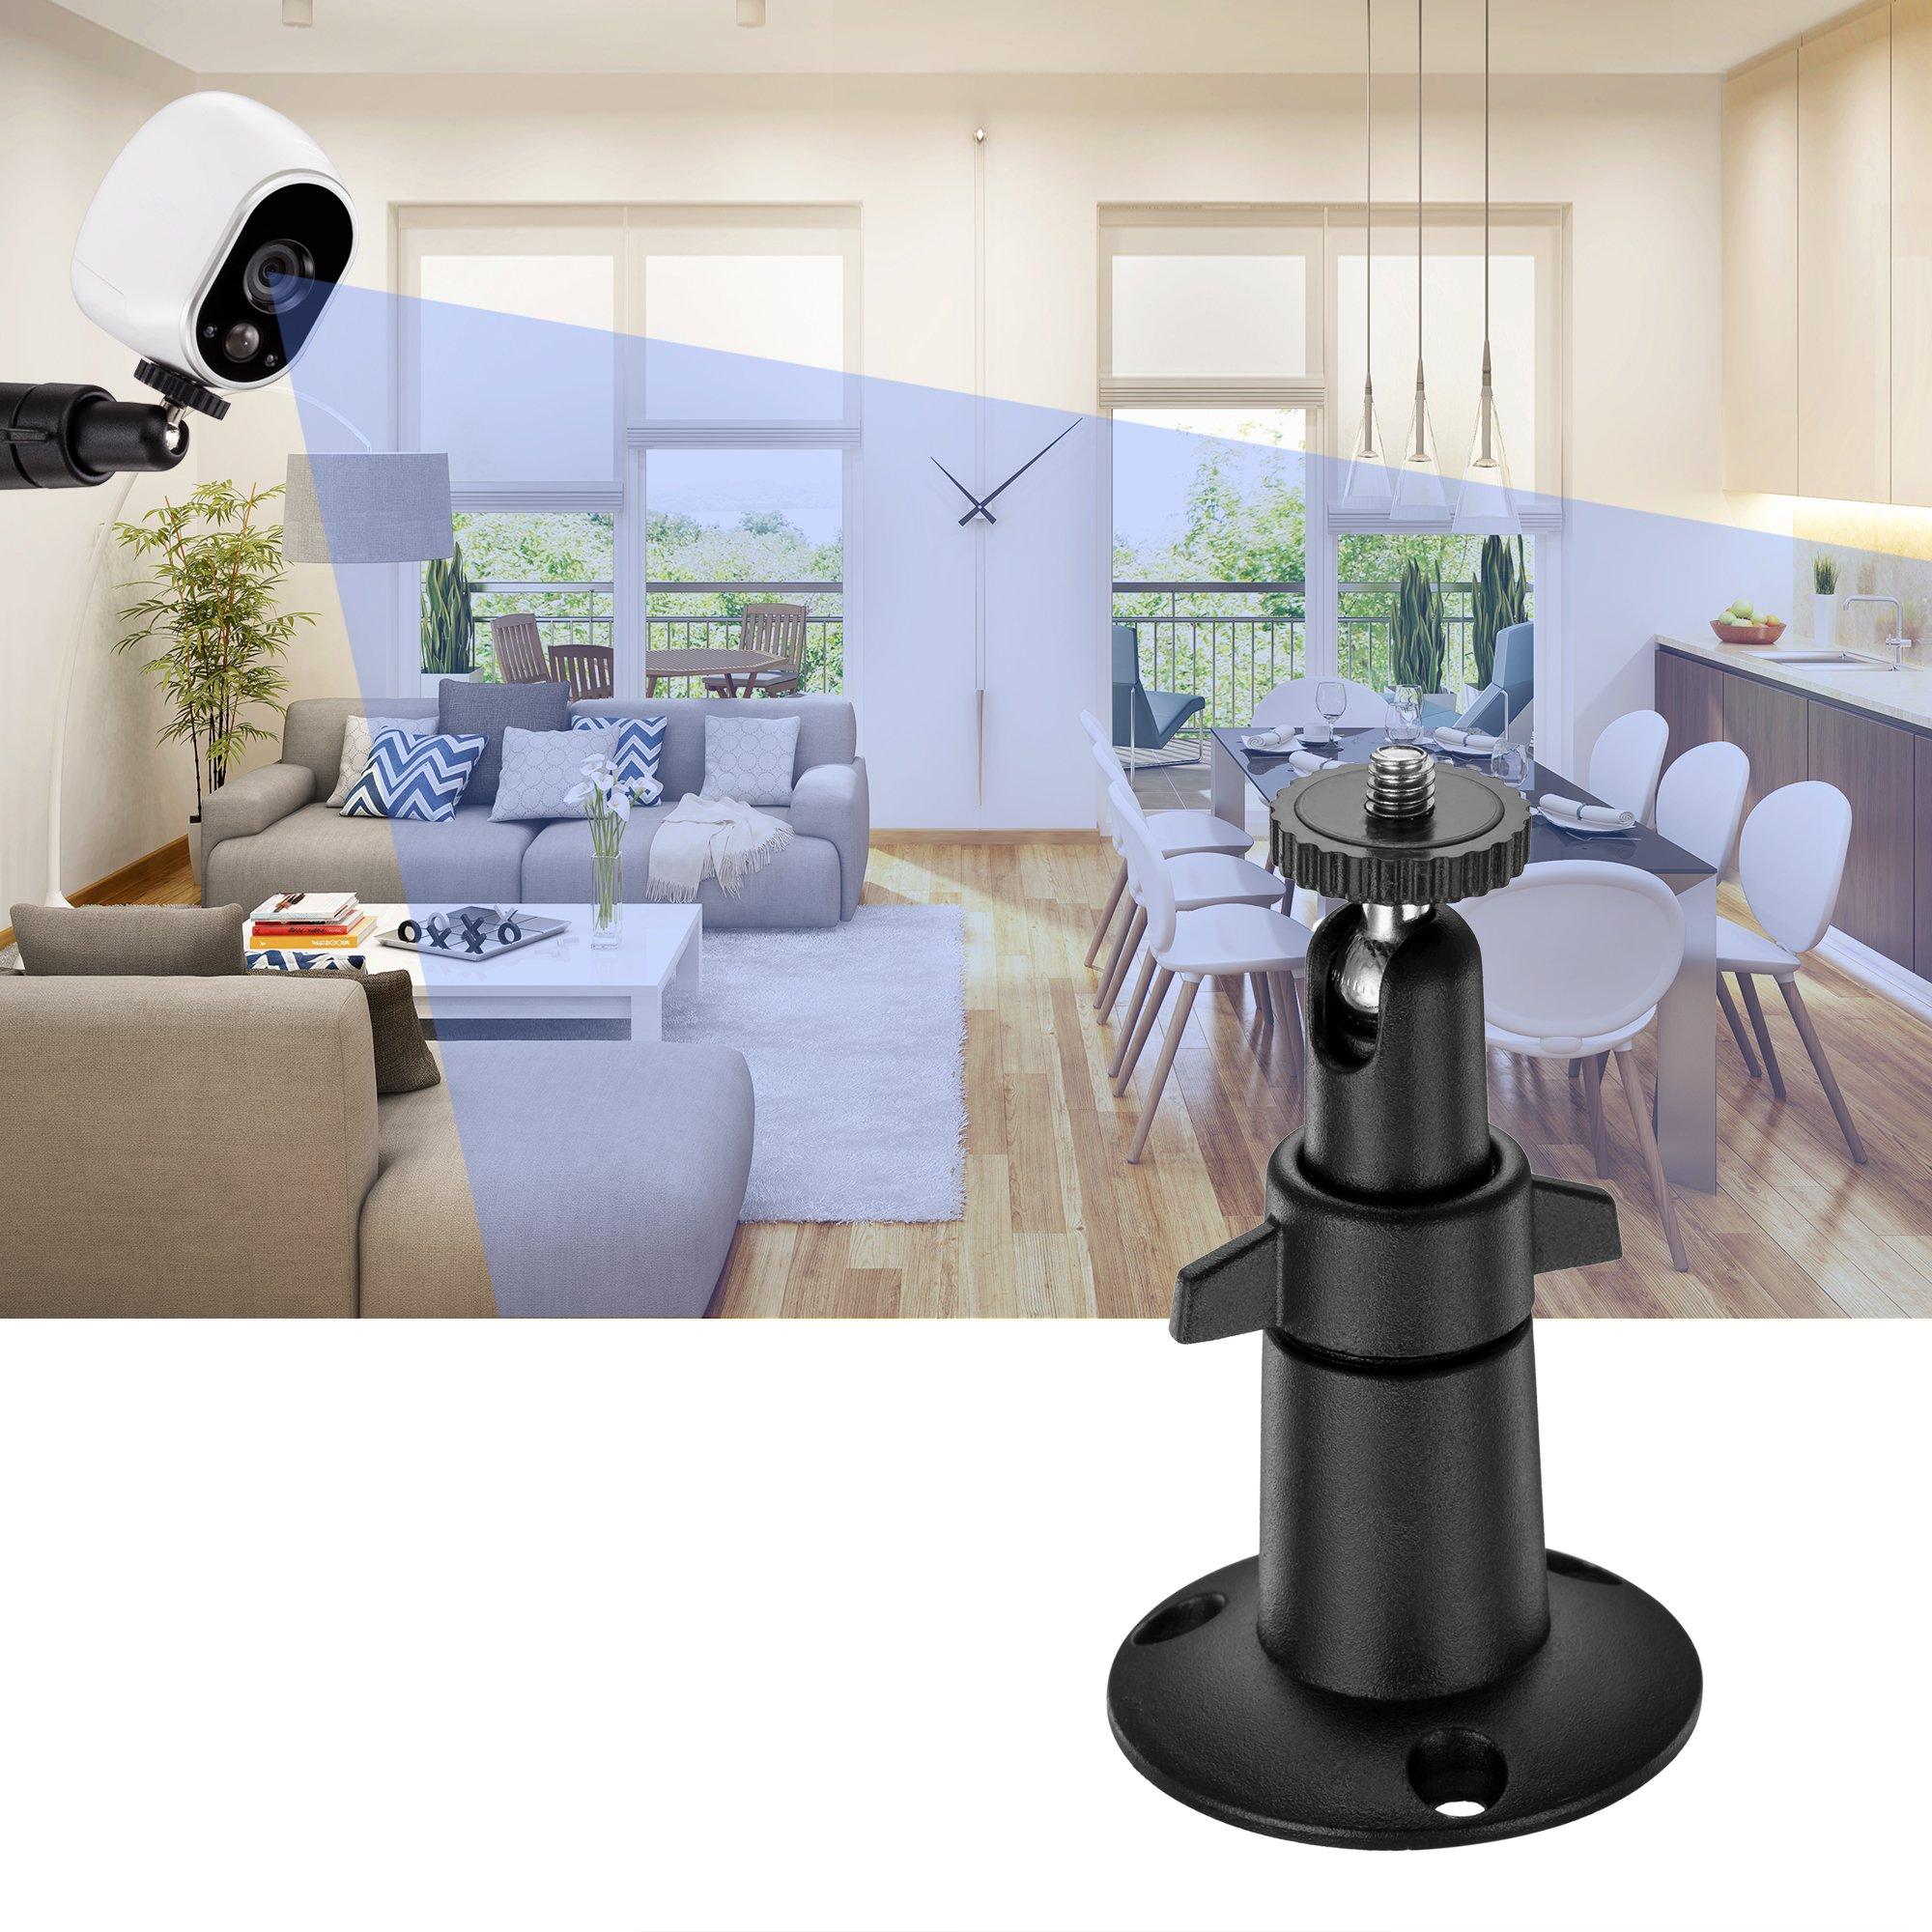 Arlo Camera Mounts (3 pcs Metal-Body/Shaft Black)